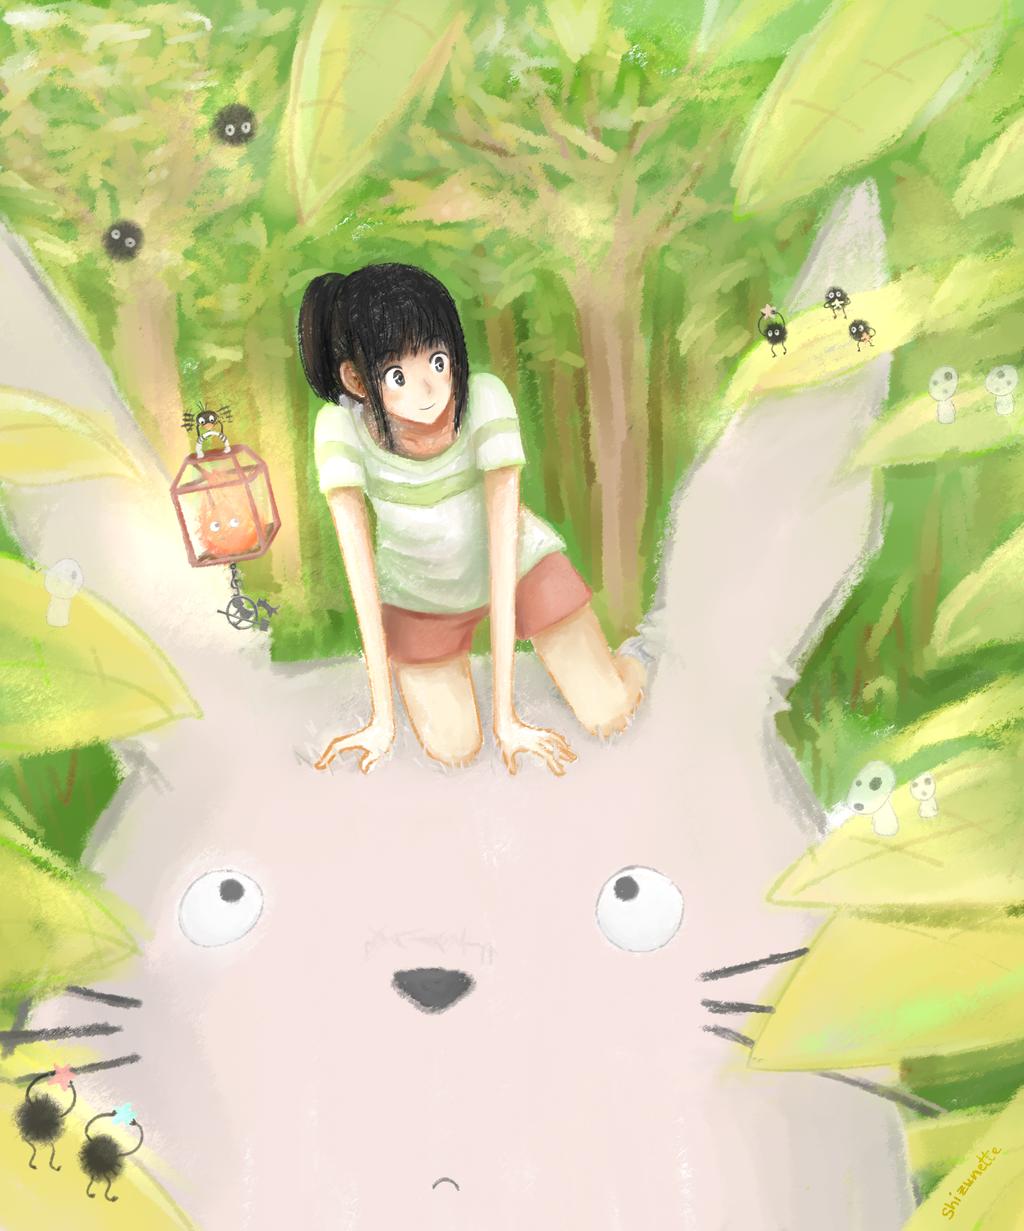 H. Miyazaki - Ballade sur un Totoro by Shizunette